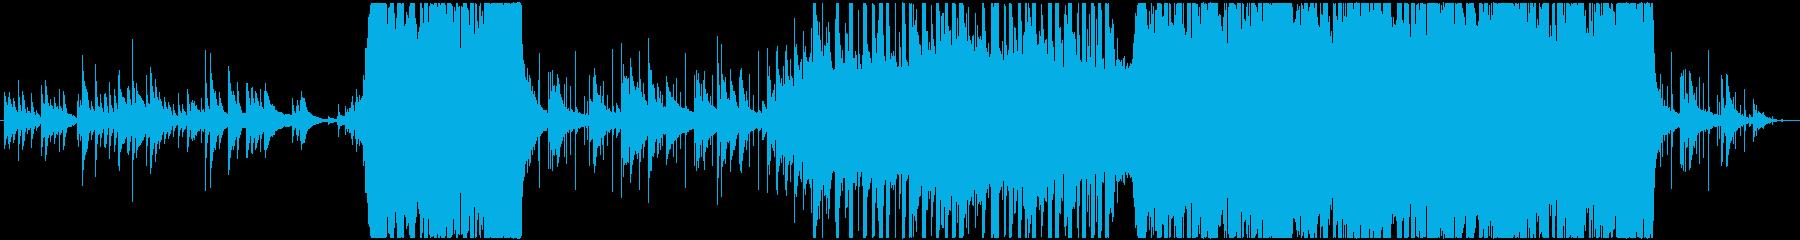 J-Popの王道なバラードの再生済みの波形